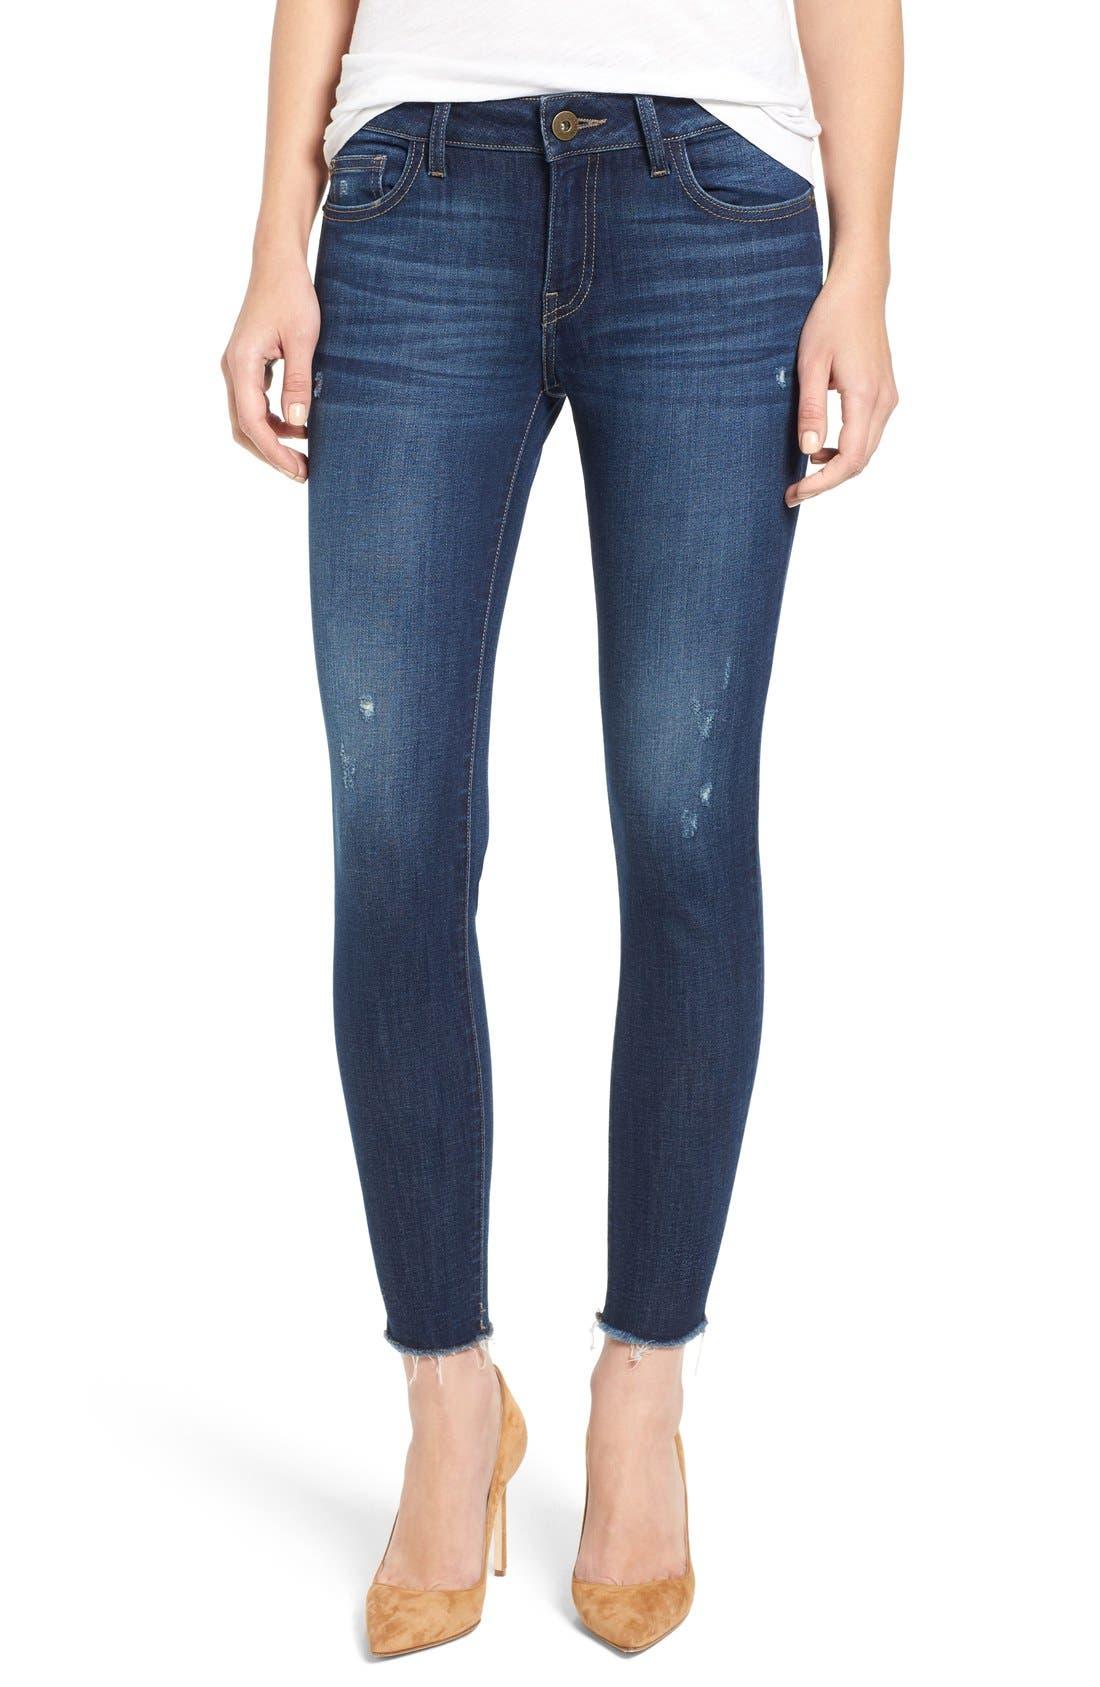 DL1961 Wagner Skinny Jeans (Blade) (Petite)